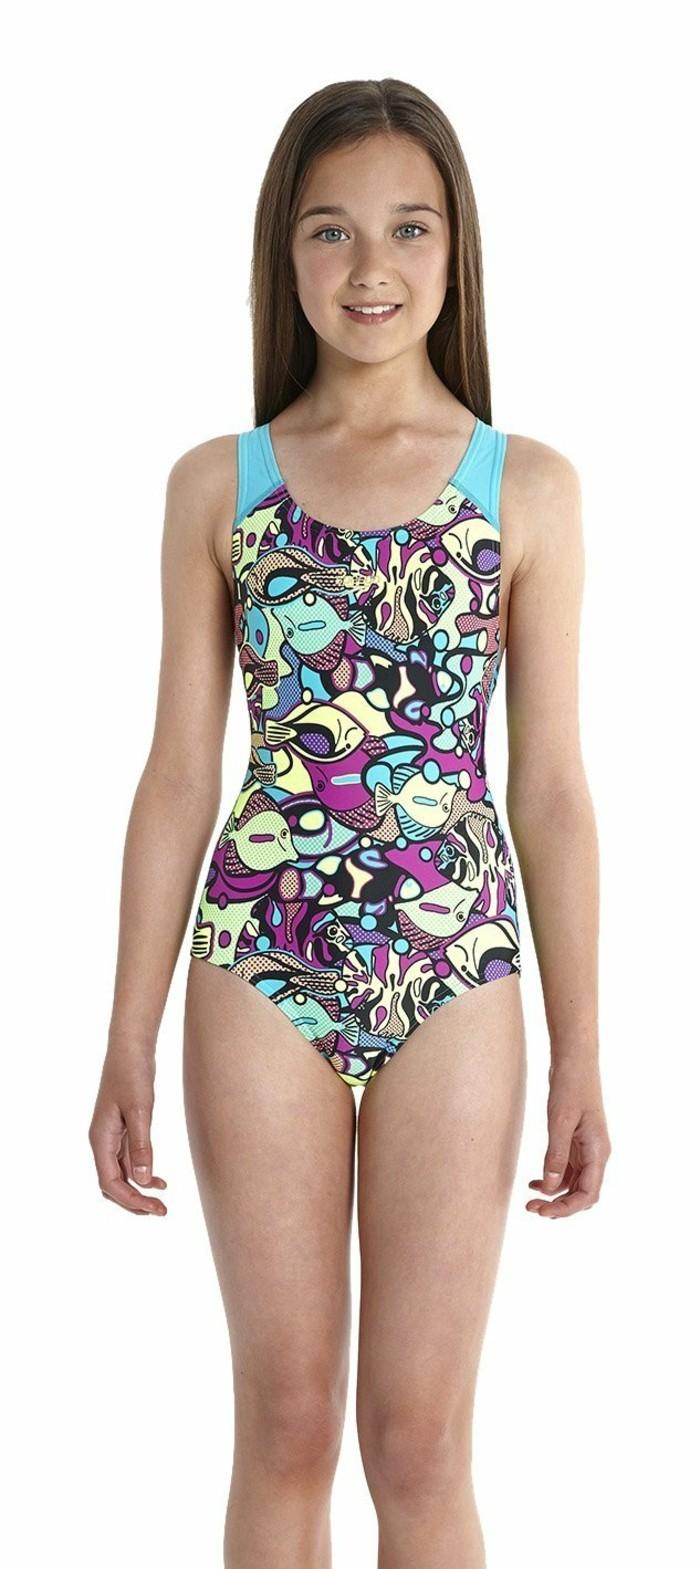 maillot-de-bain-fille-10-ans-Speedo-sur-Twenga-resized